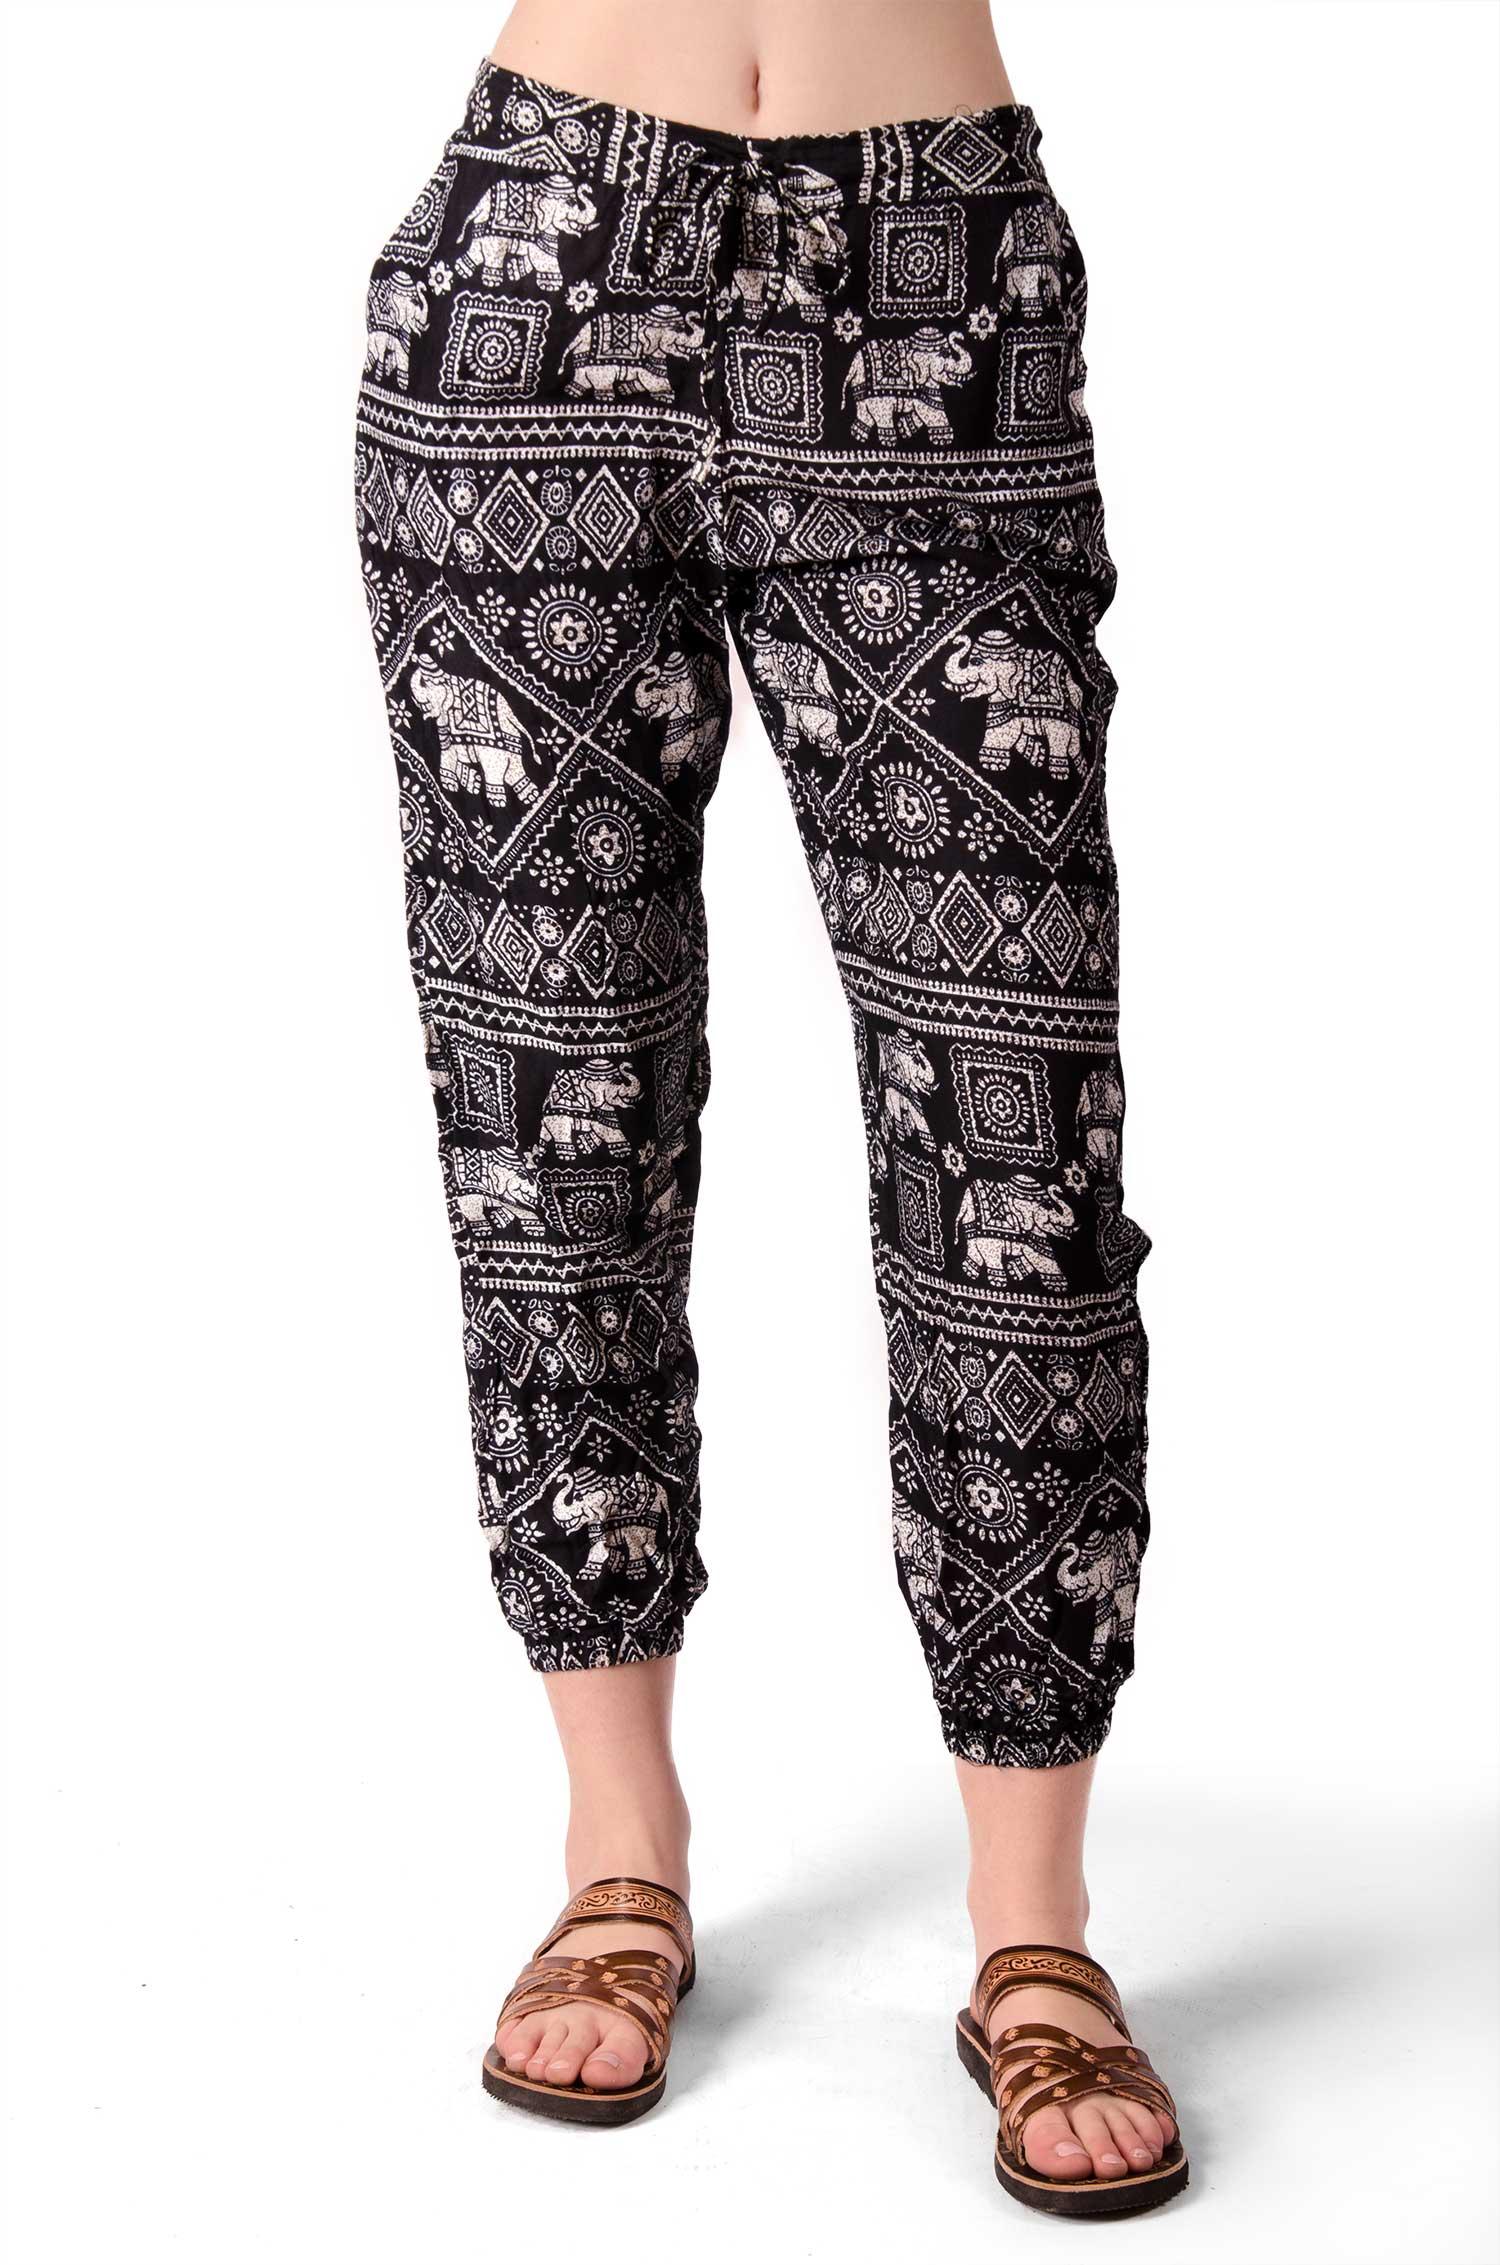 Elephant Print Capri Pants - Black - 4473Y